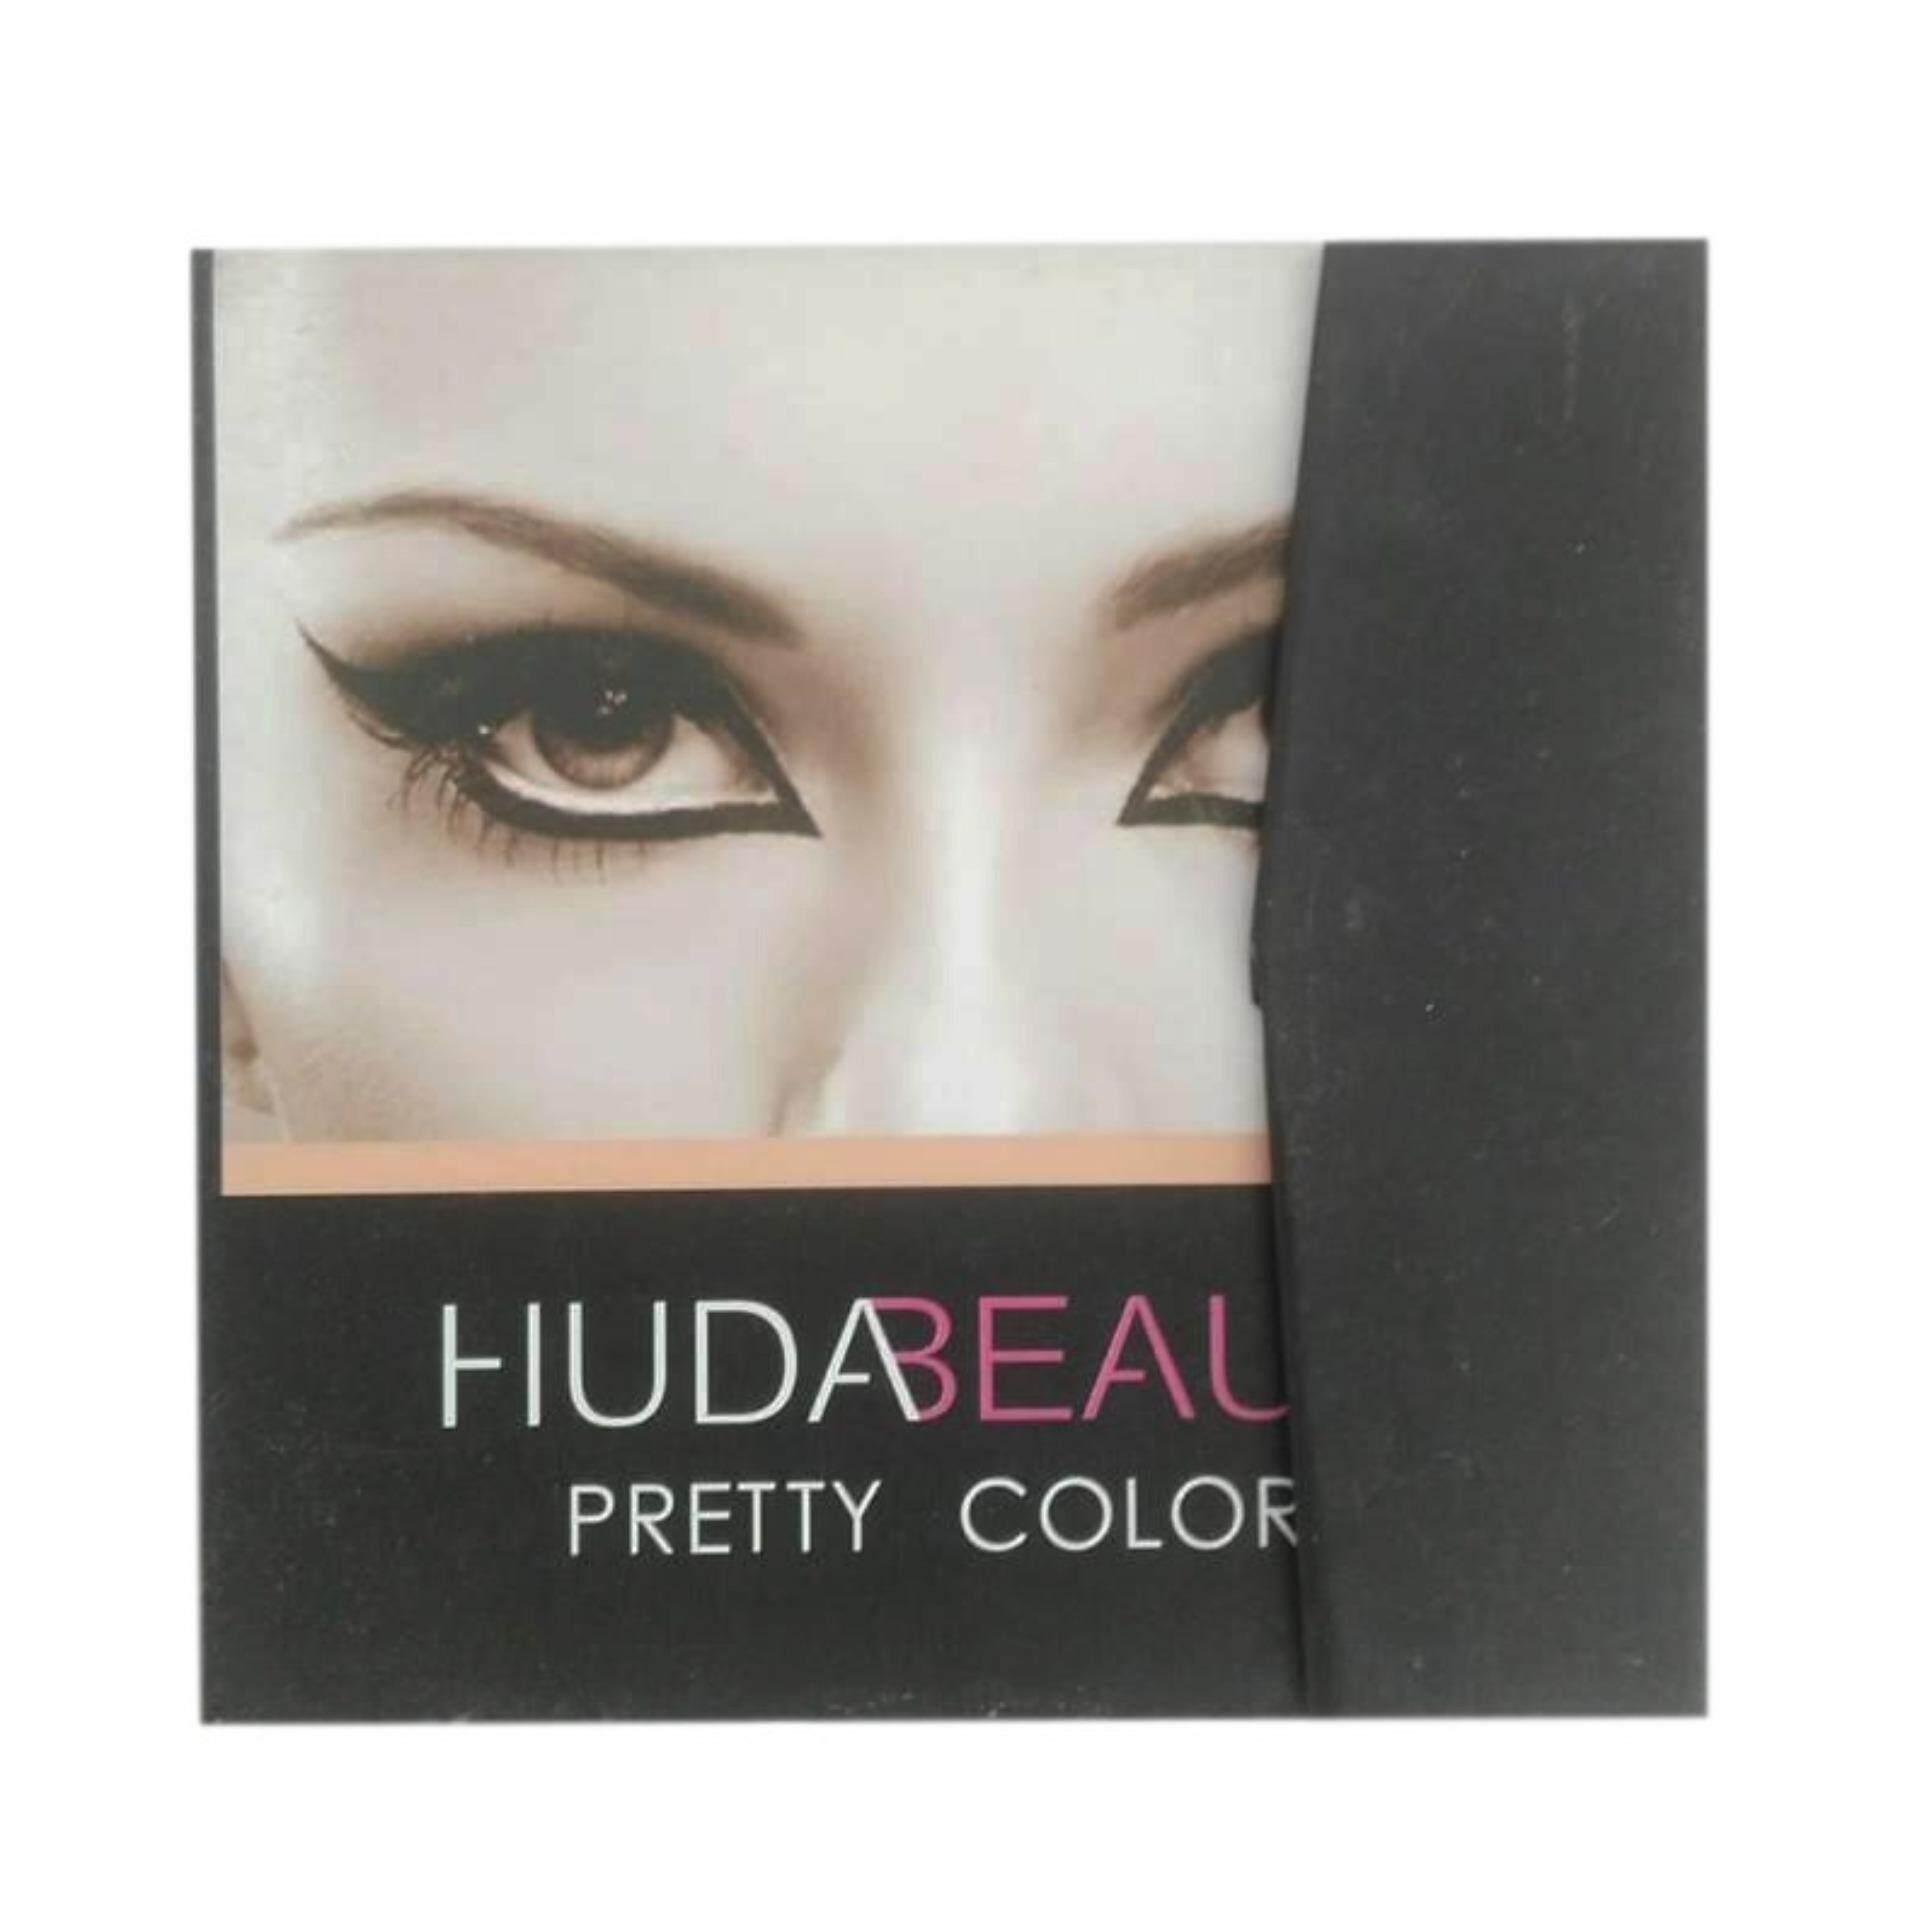 Branded Pretty Color Make Up Kit With Free Make Up Brush Set & Lip Liner